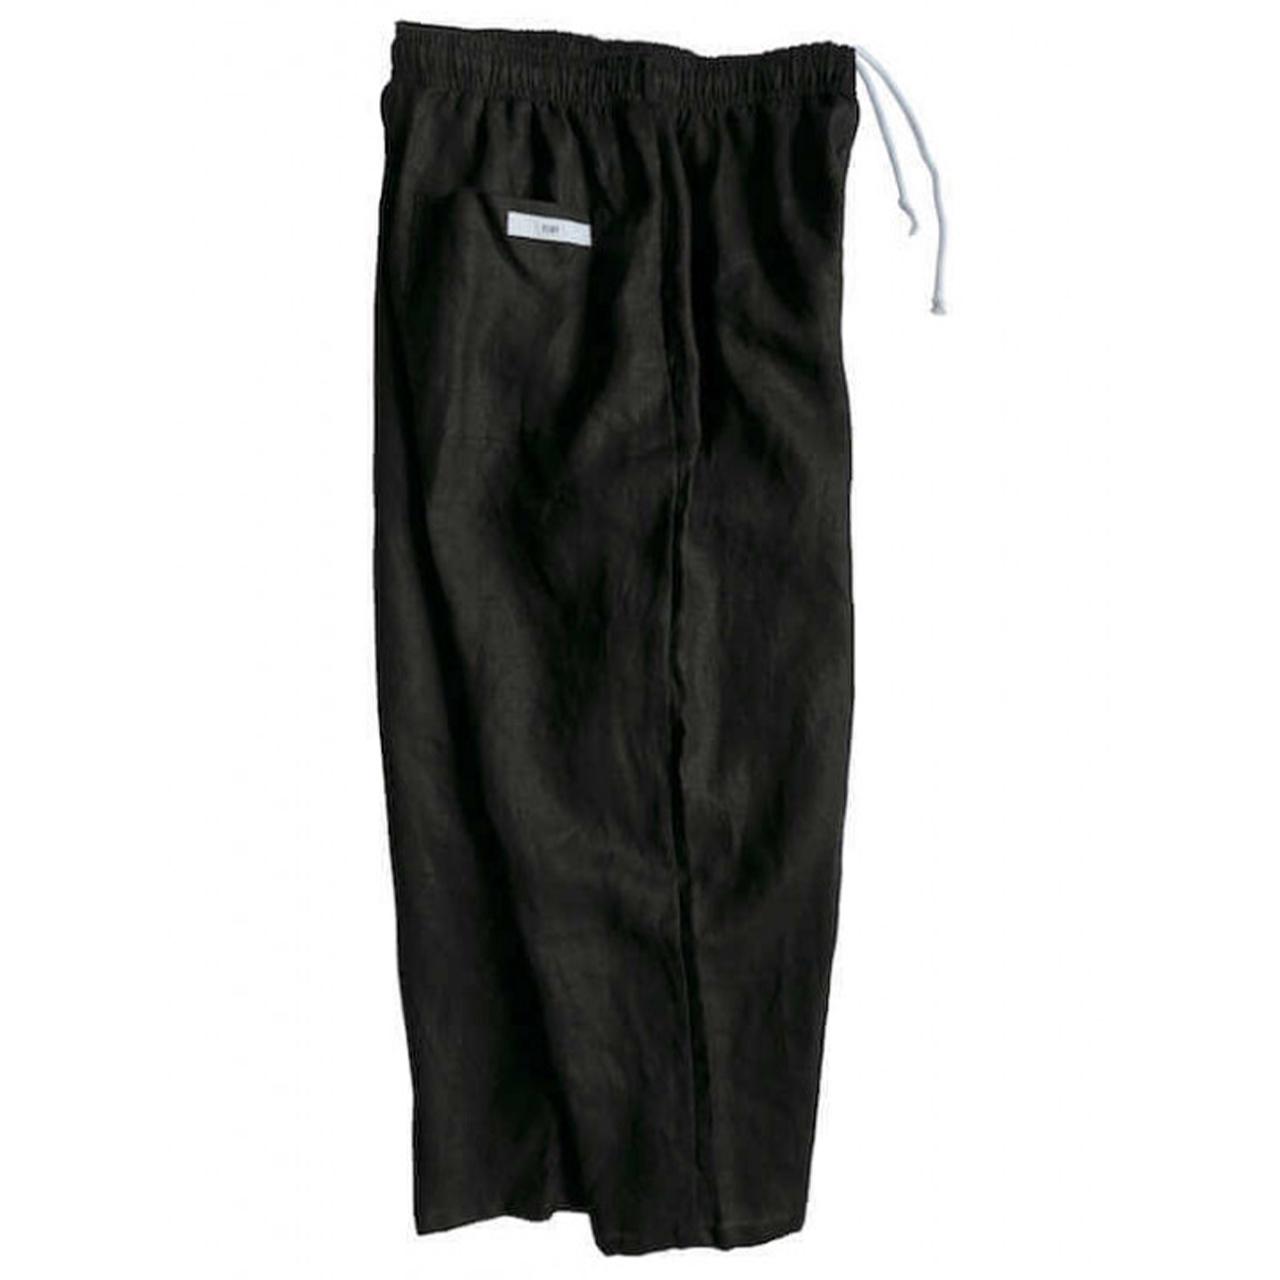 VOIRY SUNDAY PANTS-LINEN BLACK